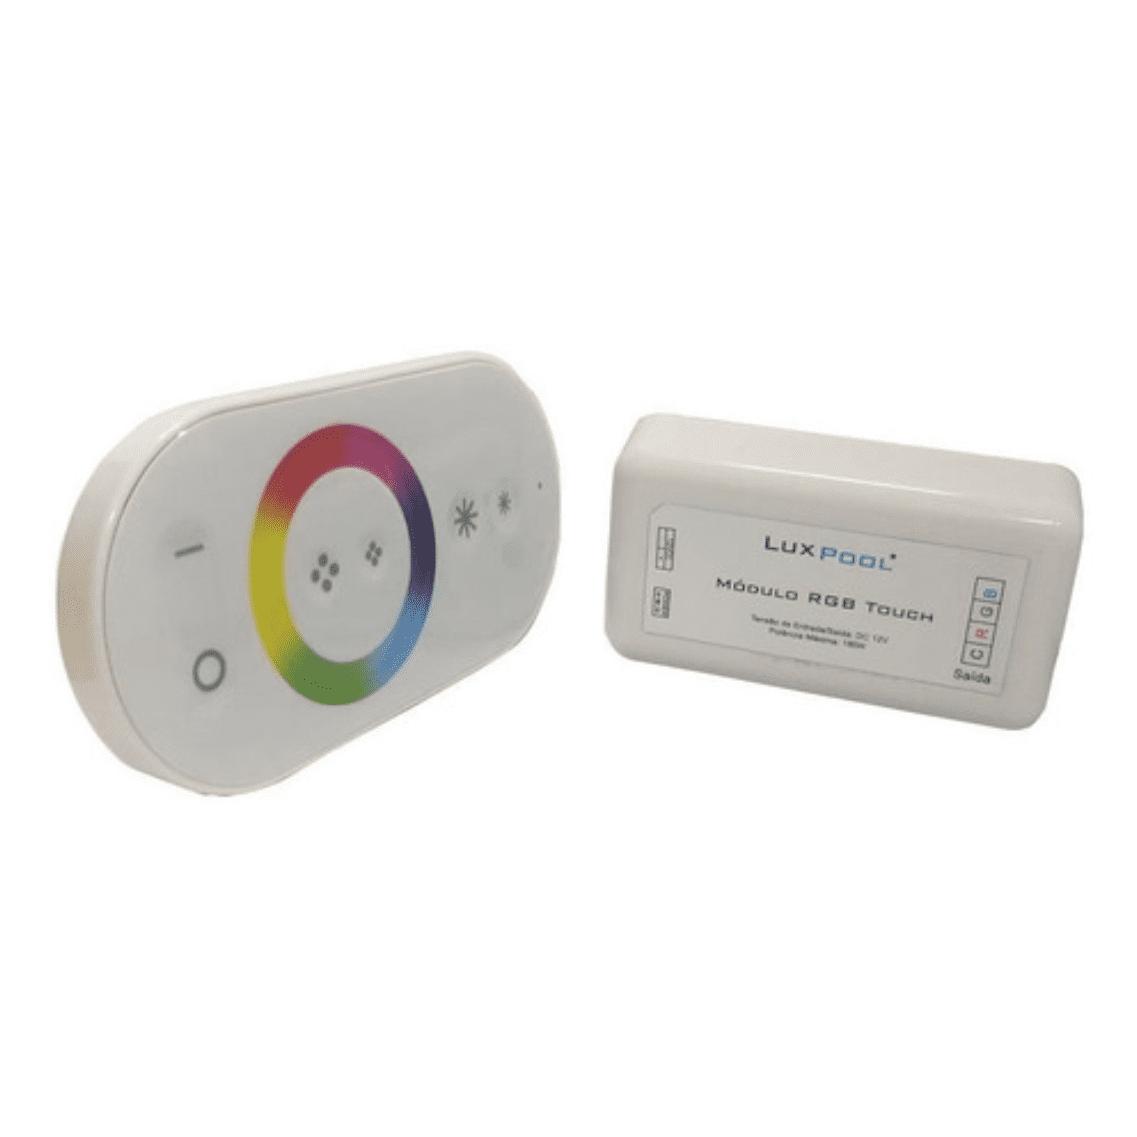 Kit 3 Leds 9W Iluminação Piscina + Módulo Rgb Touch C/ Fonte